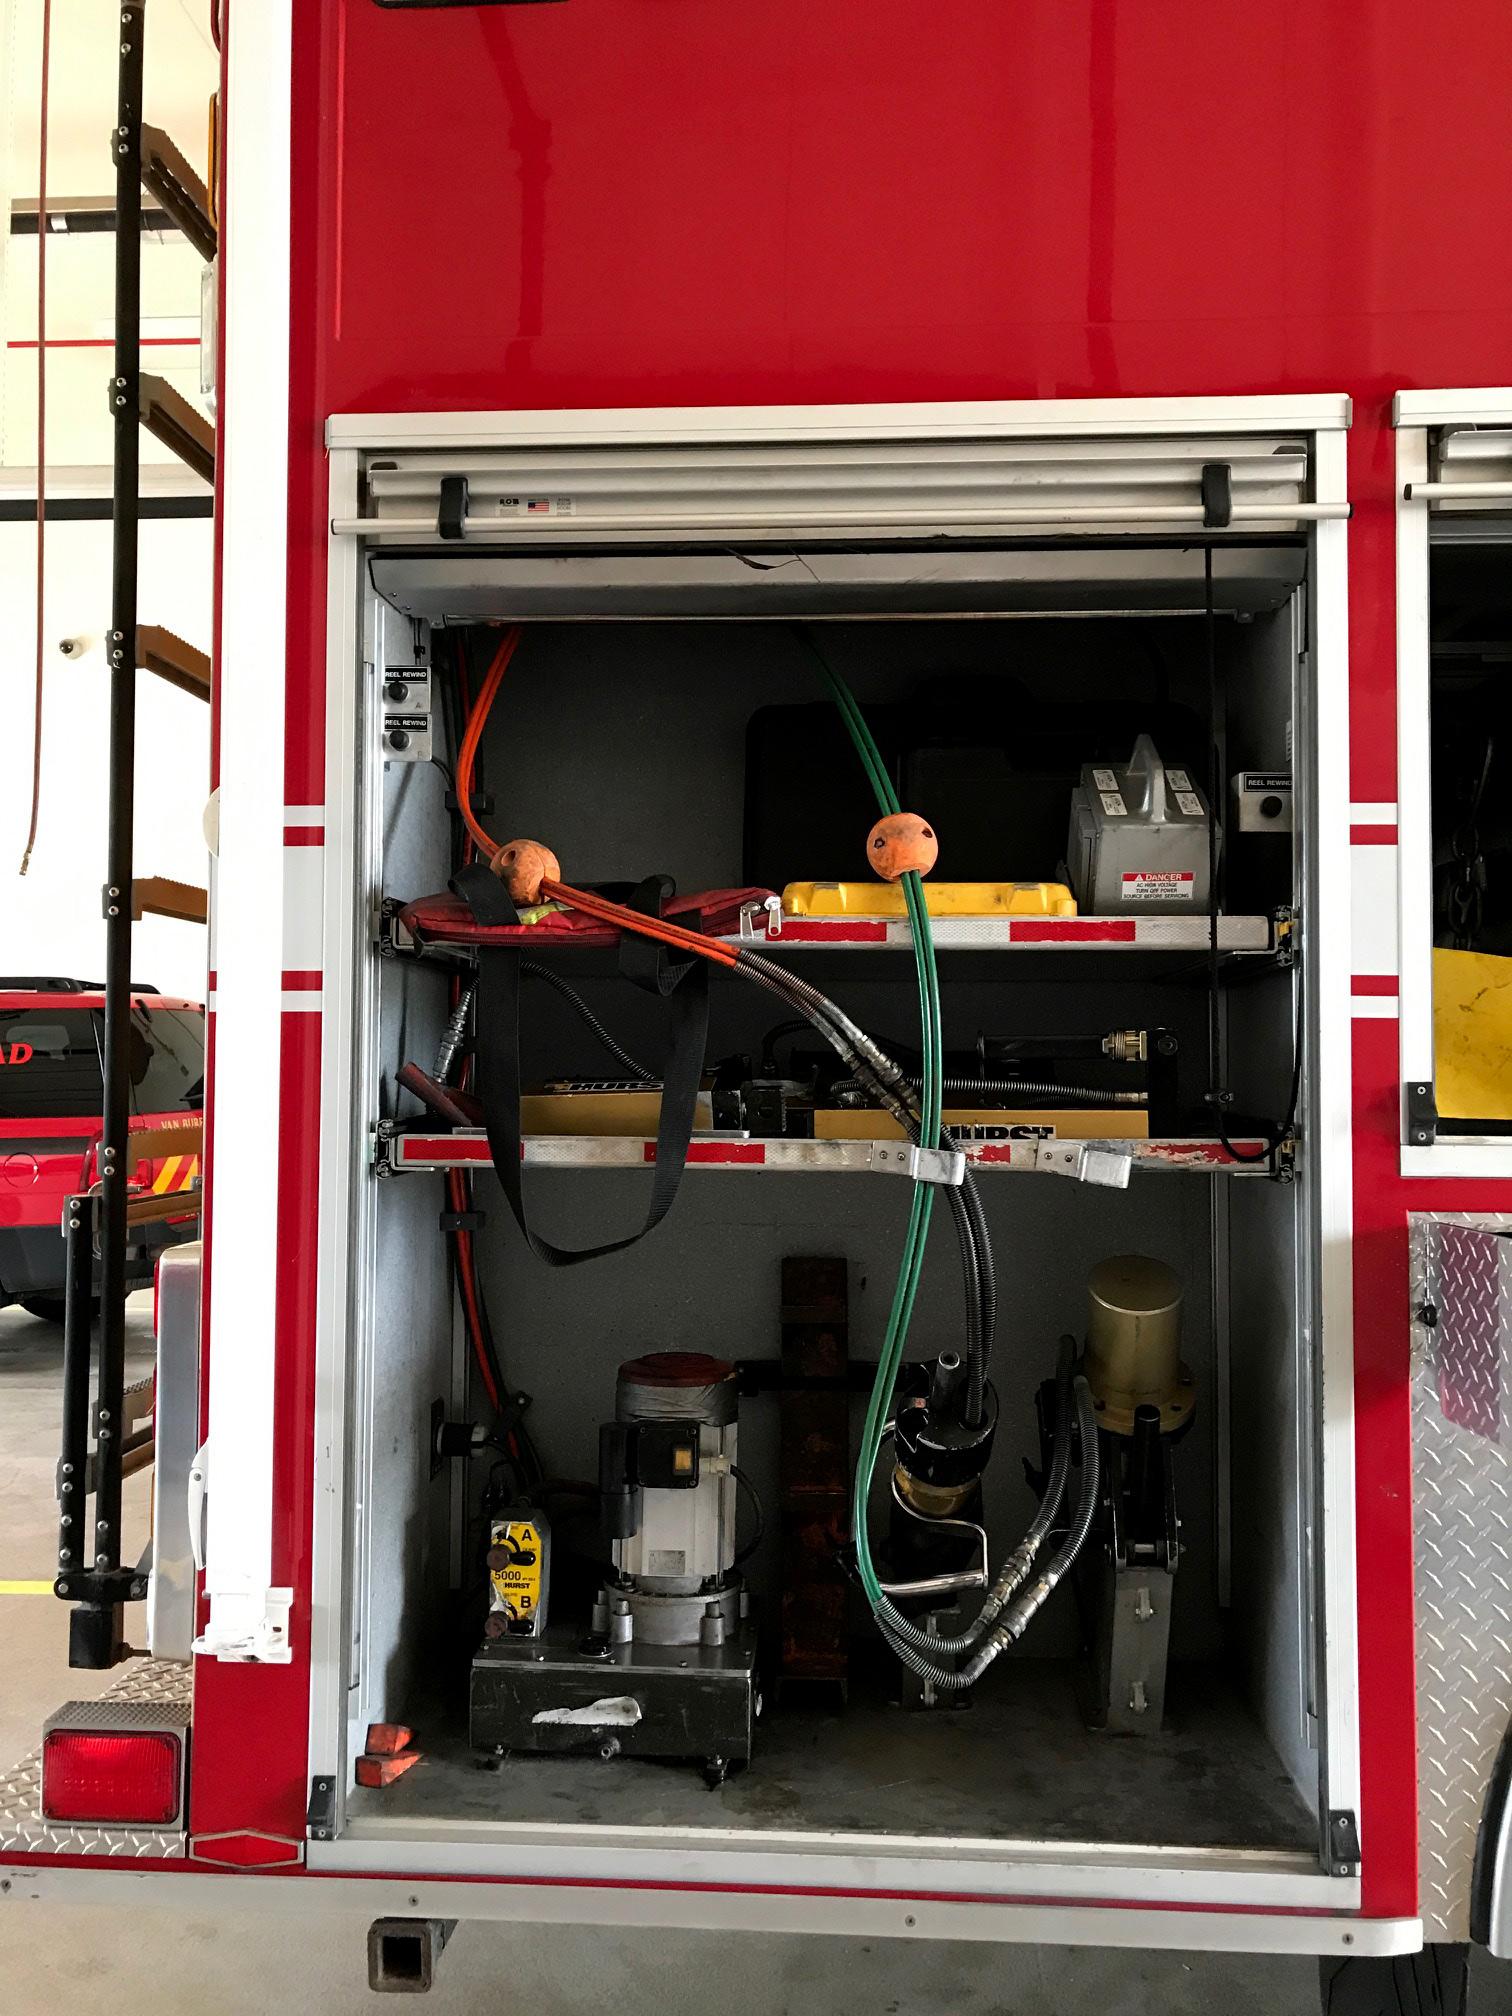 2009 Spartan MetroStar Heavy Rescue   Used Truck Details